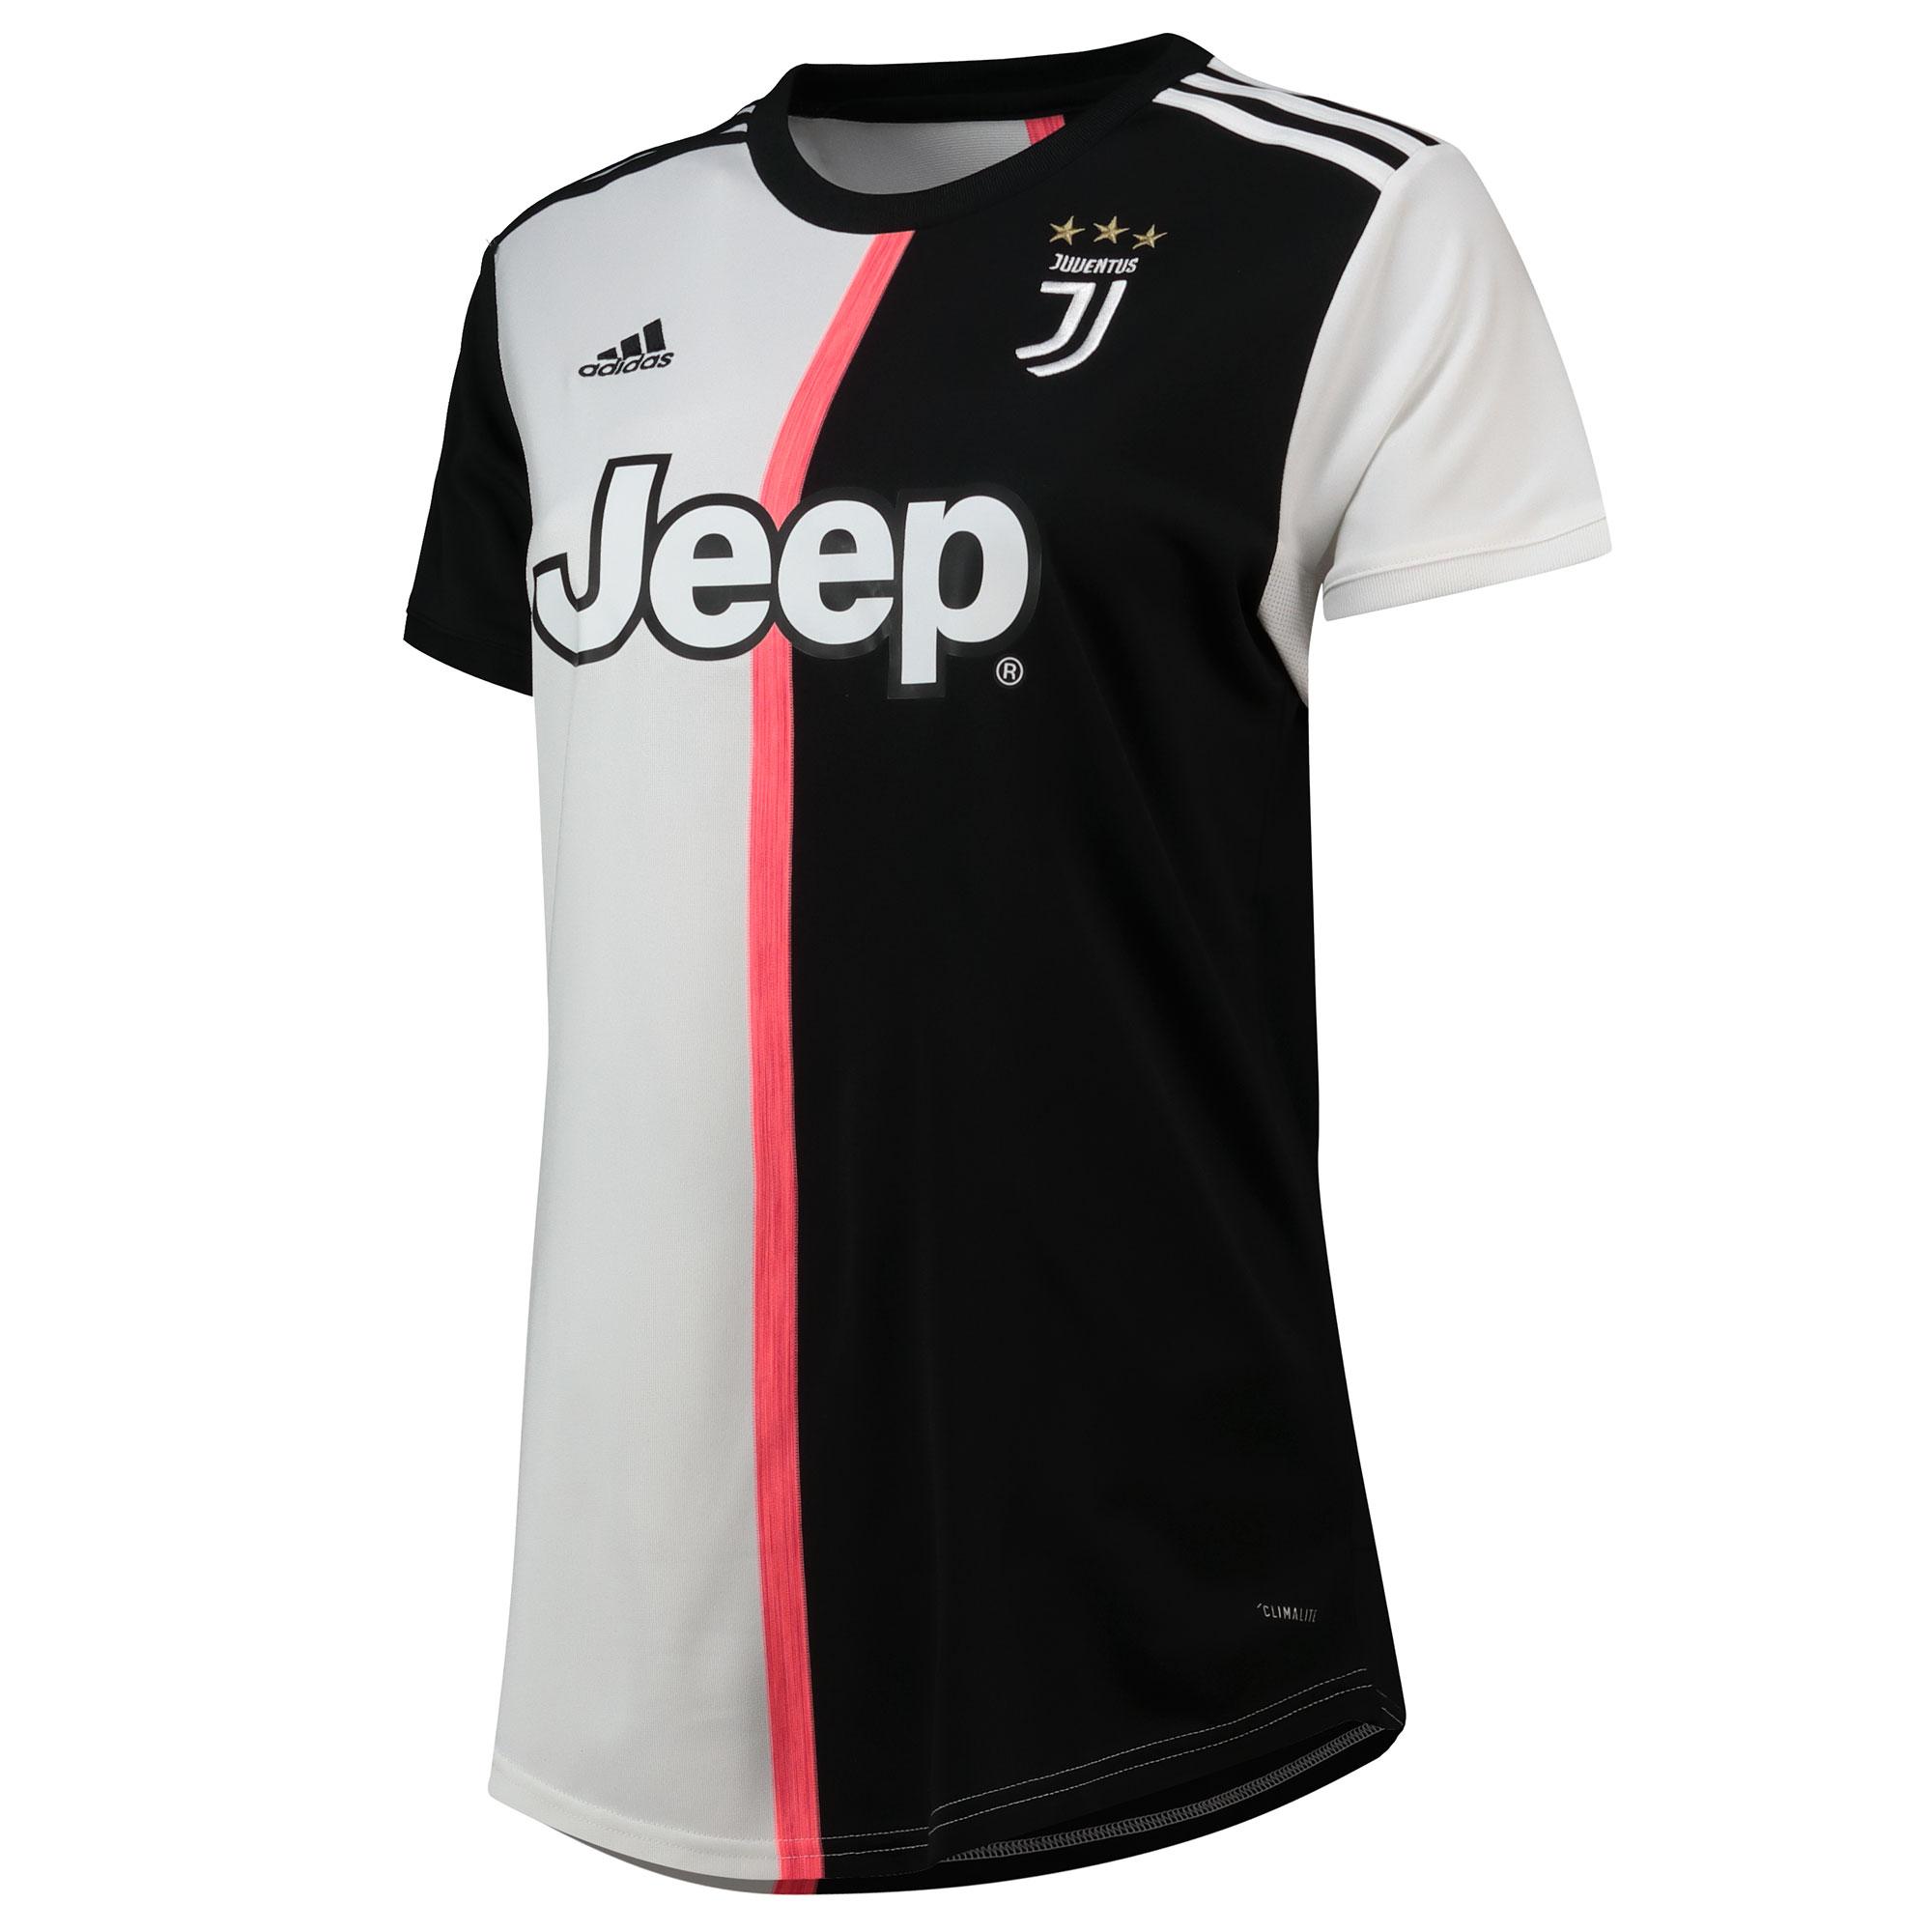 Juventus Home Shirt 2019-20 - Womens